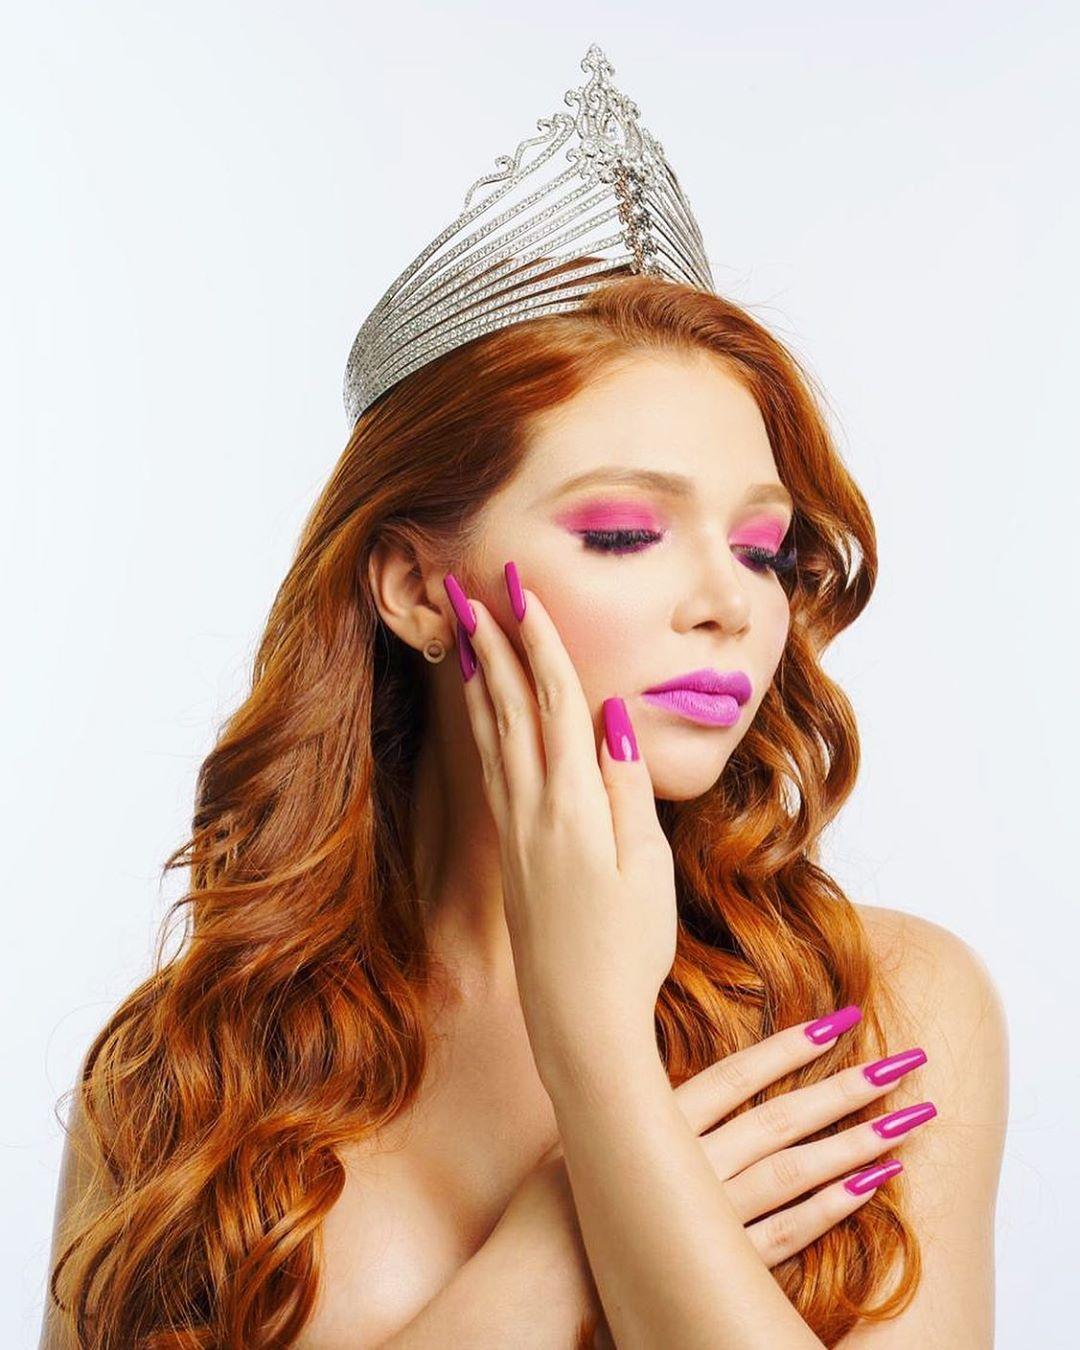 nathaly felix, top 20 de miss brasil mundo 2019. 75467917